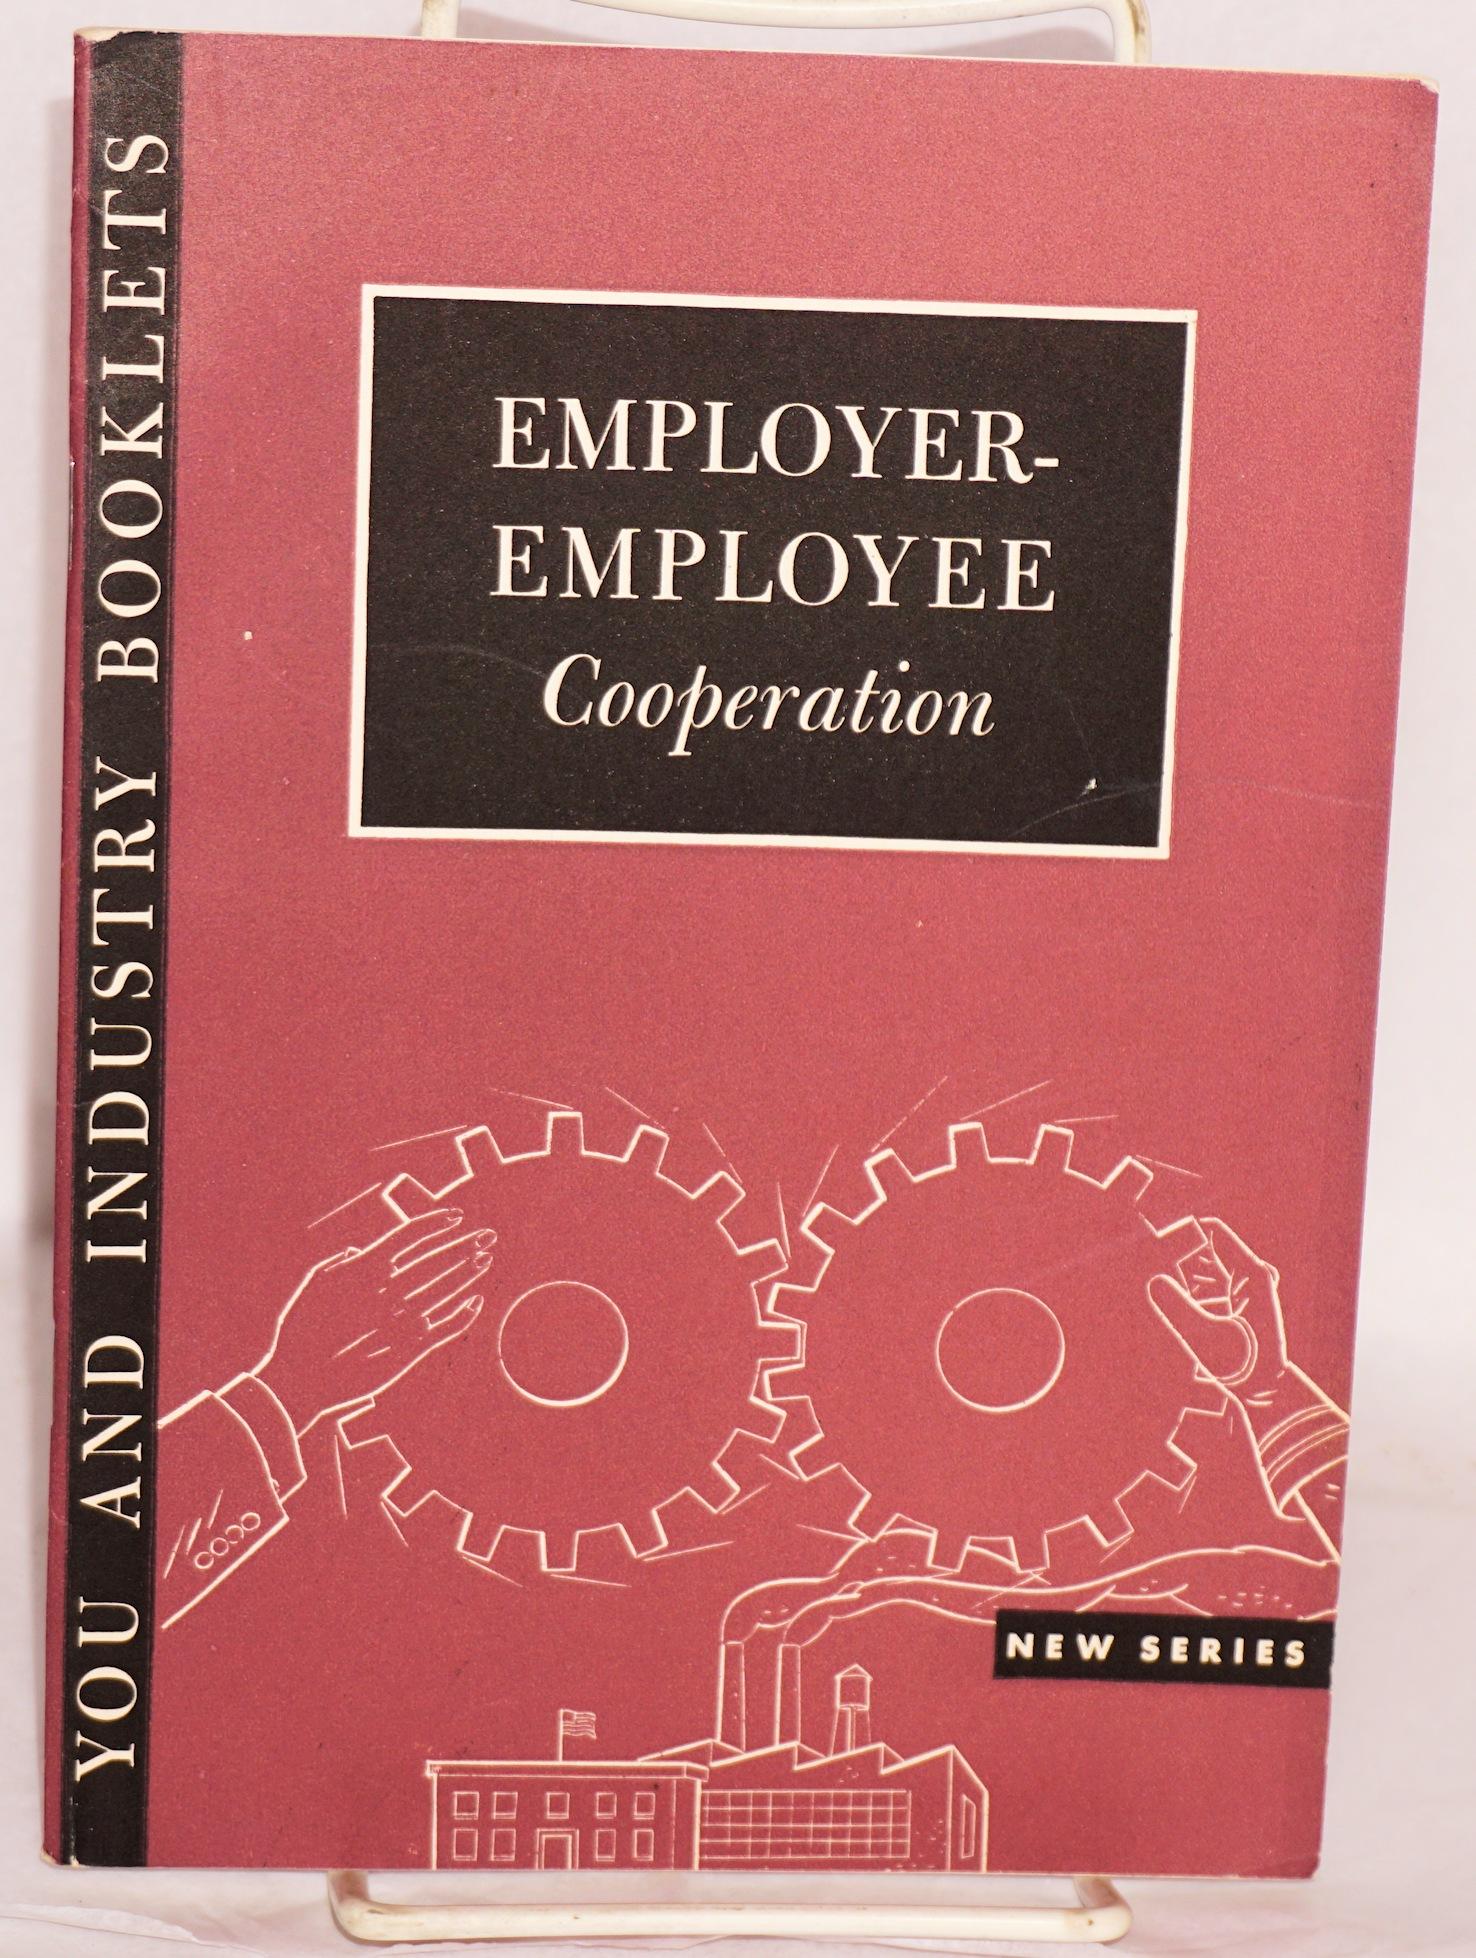 Employer-employee cooperation